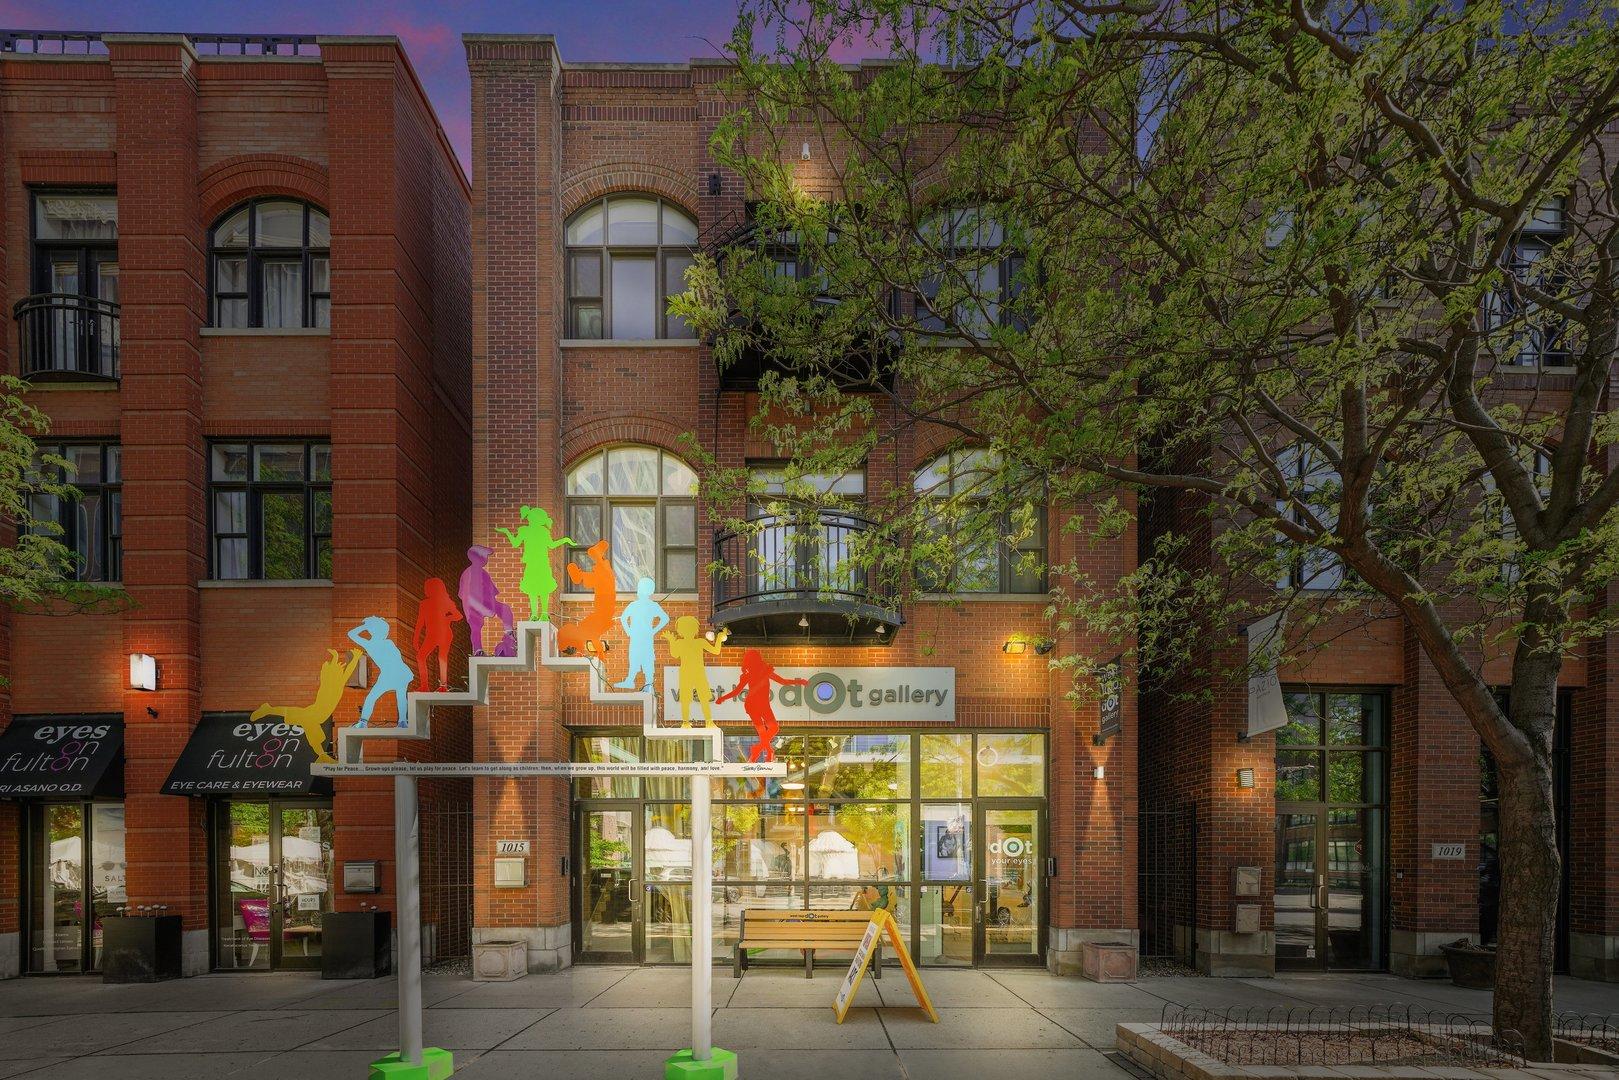 1015 W Fulton Market Street, Chicago, IL 60607